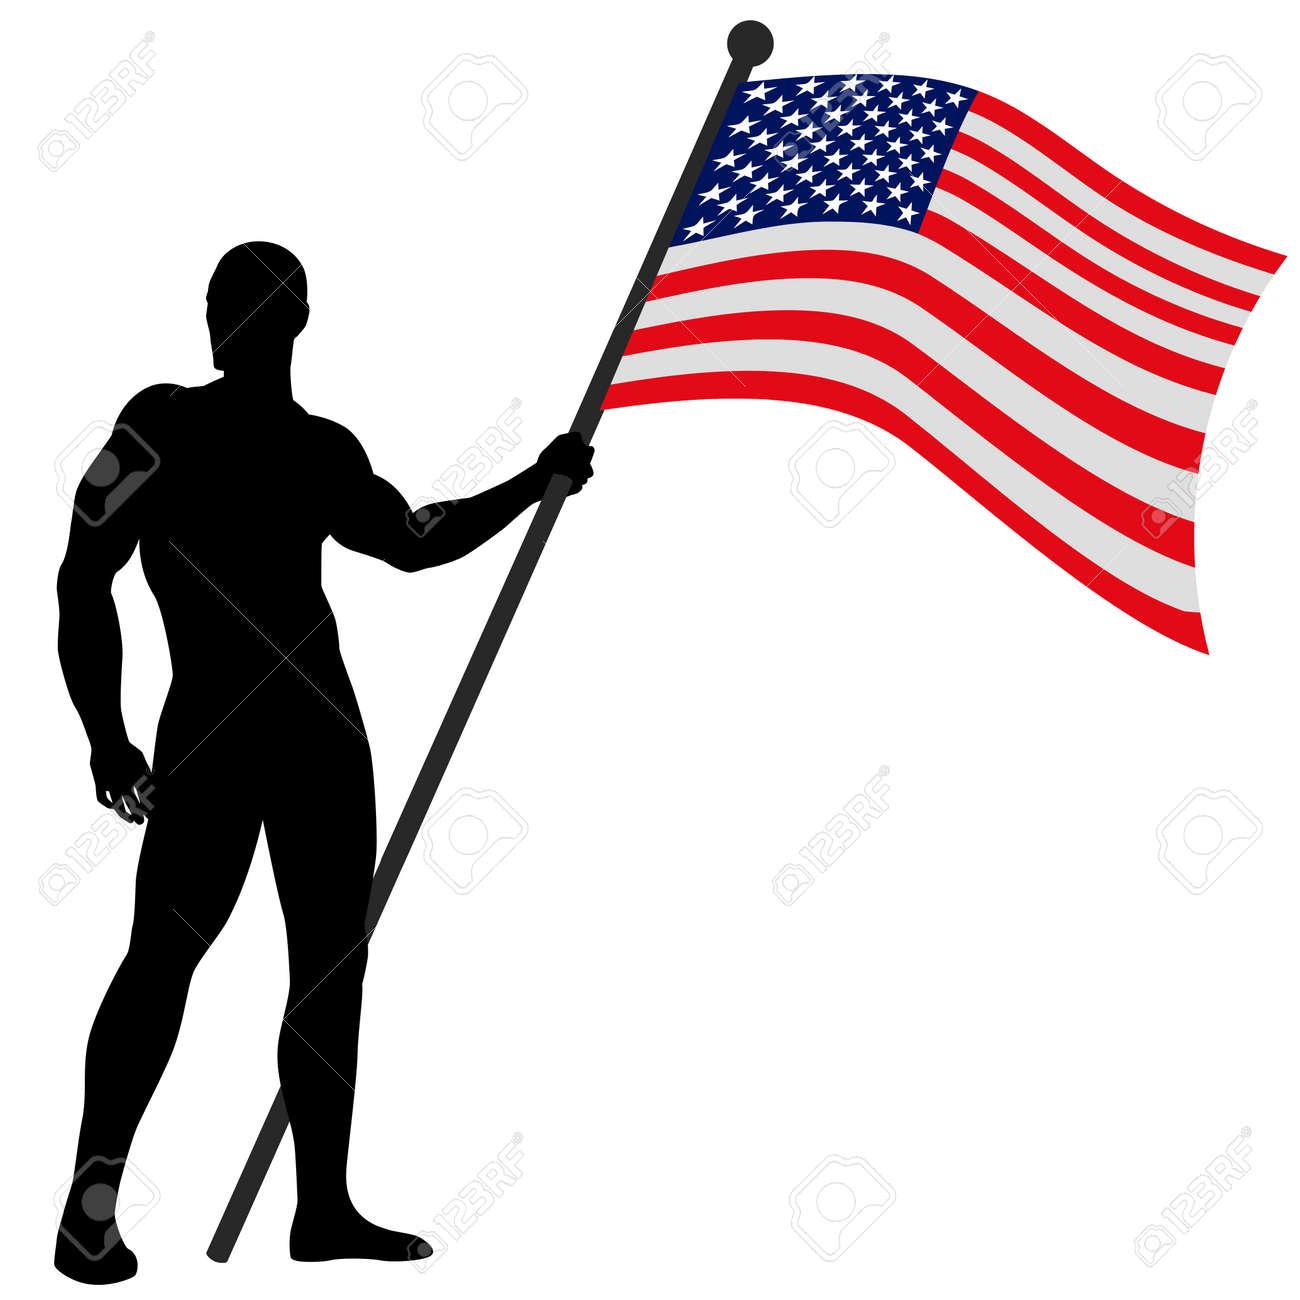 Vector illustration of a flag bearer Stock Vector - 9061603